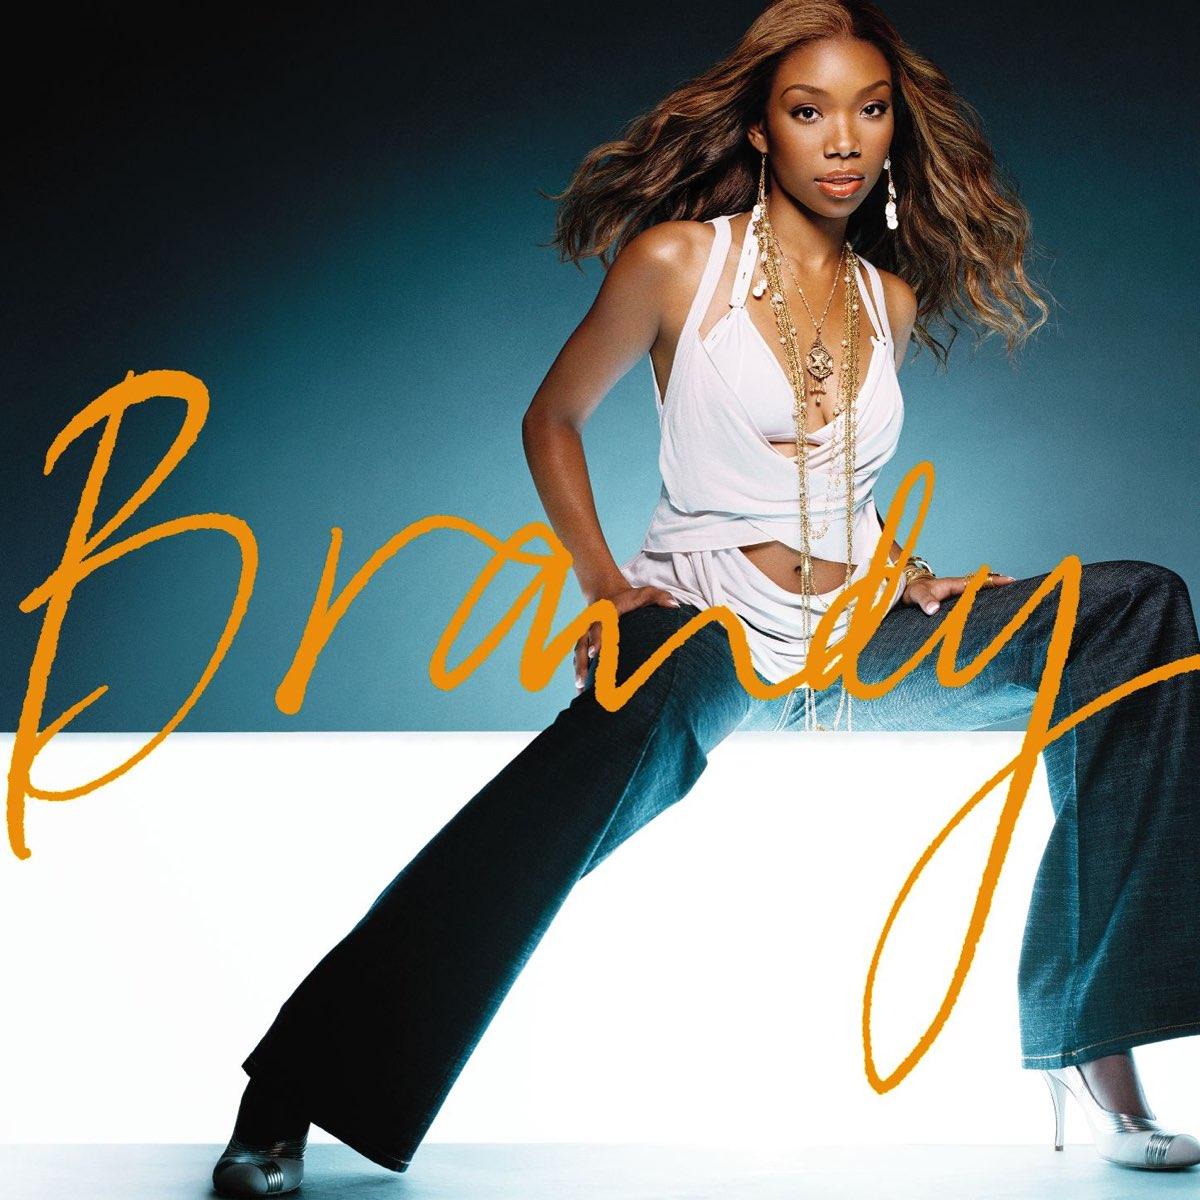 Brandy, Afrodisiac